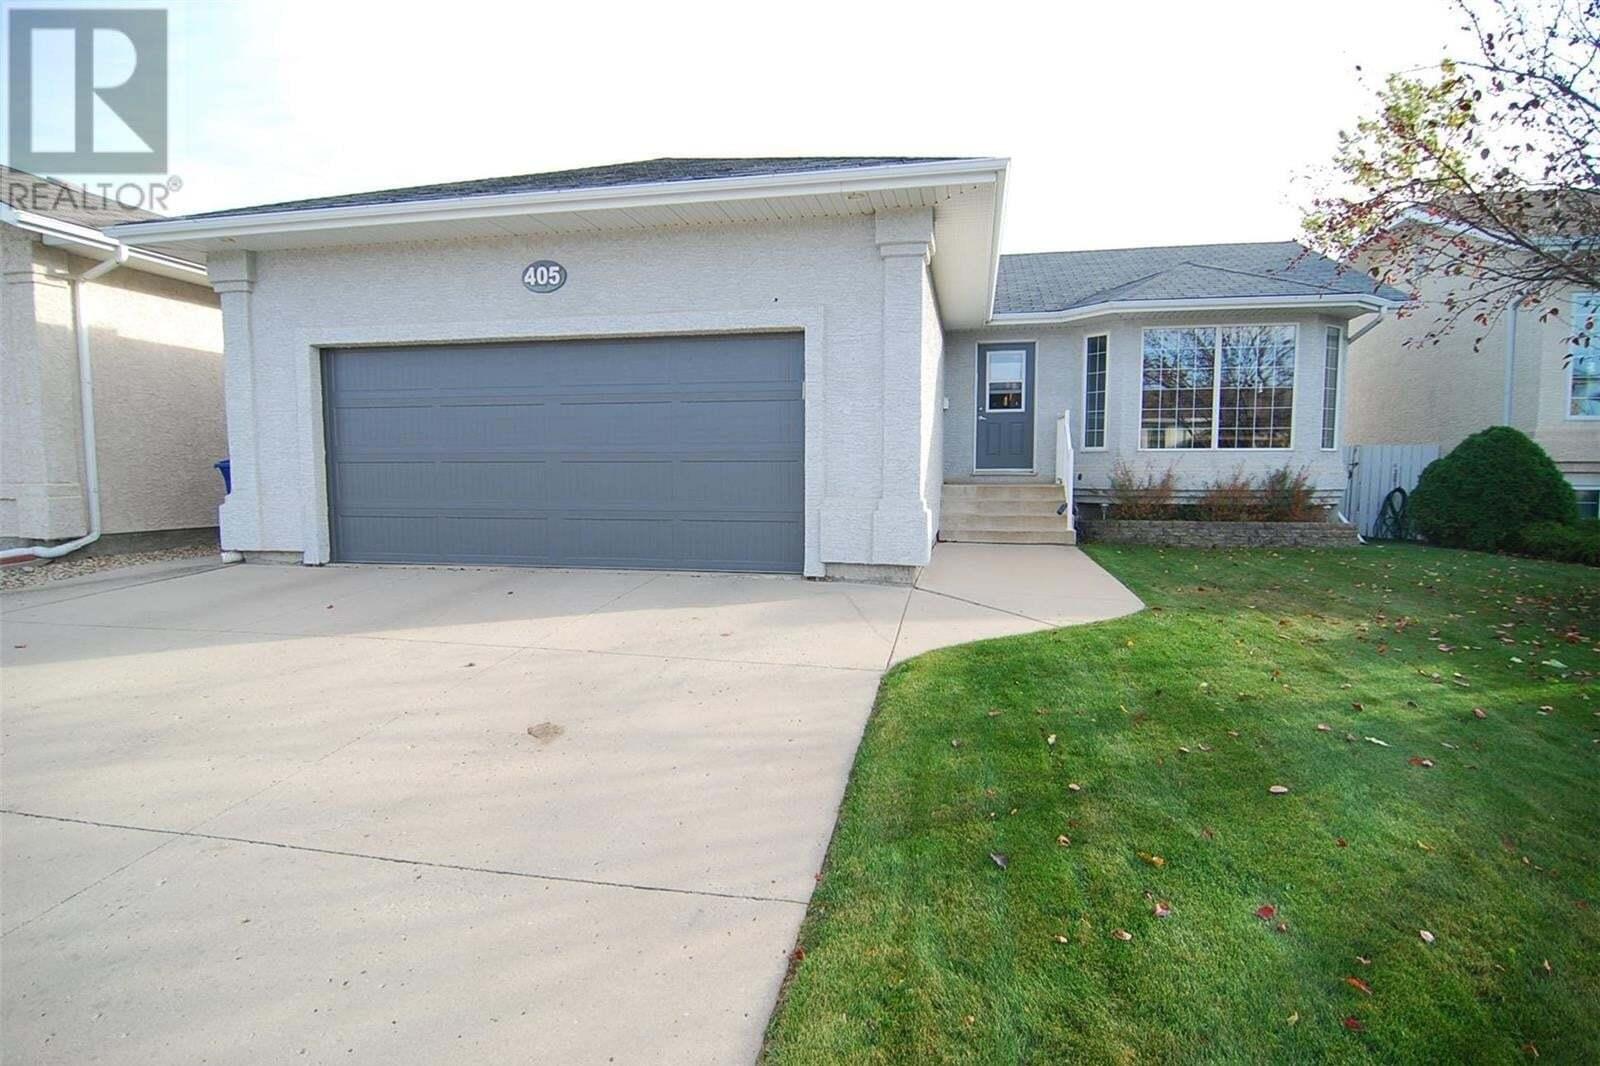 House for sale at 405 Crystal Cres Warman Saskatchewan - MLS: SK827990